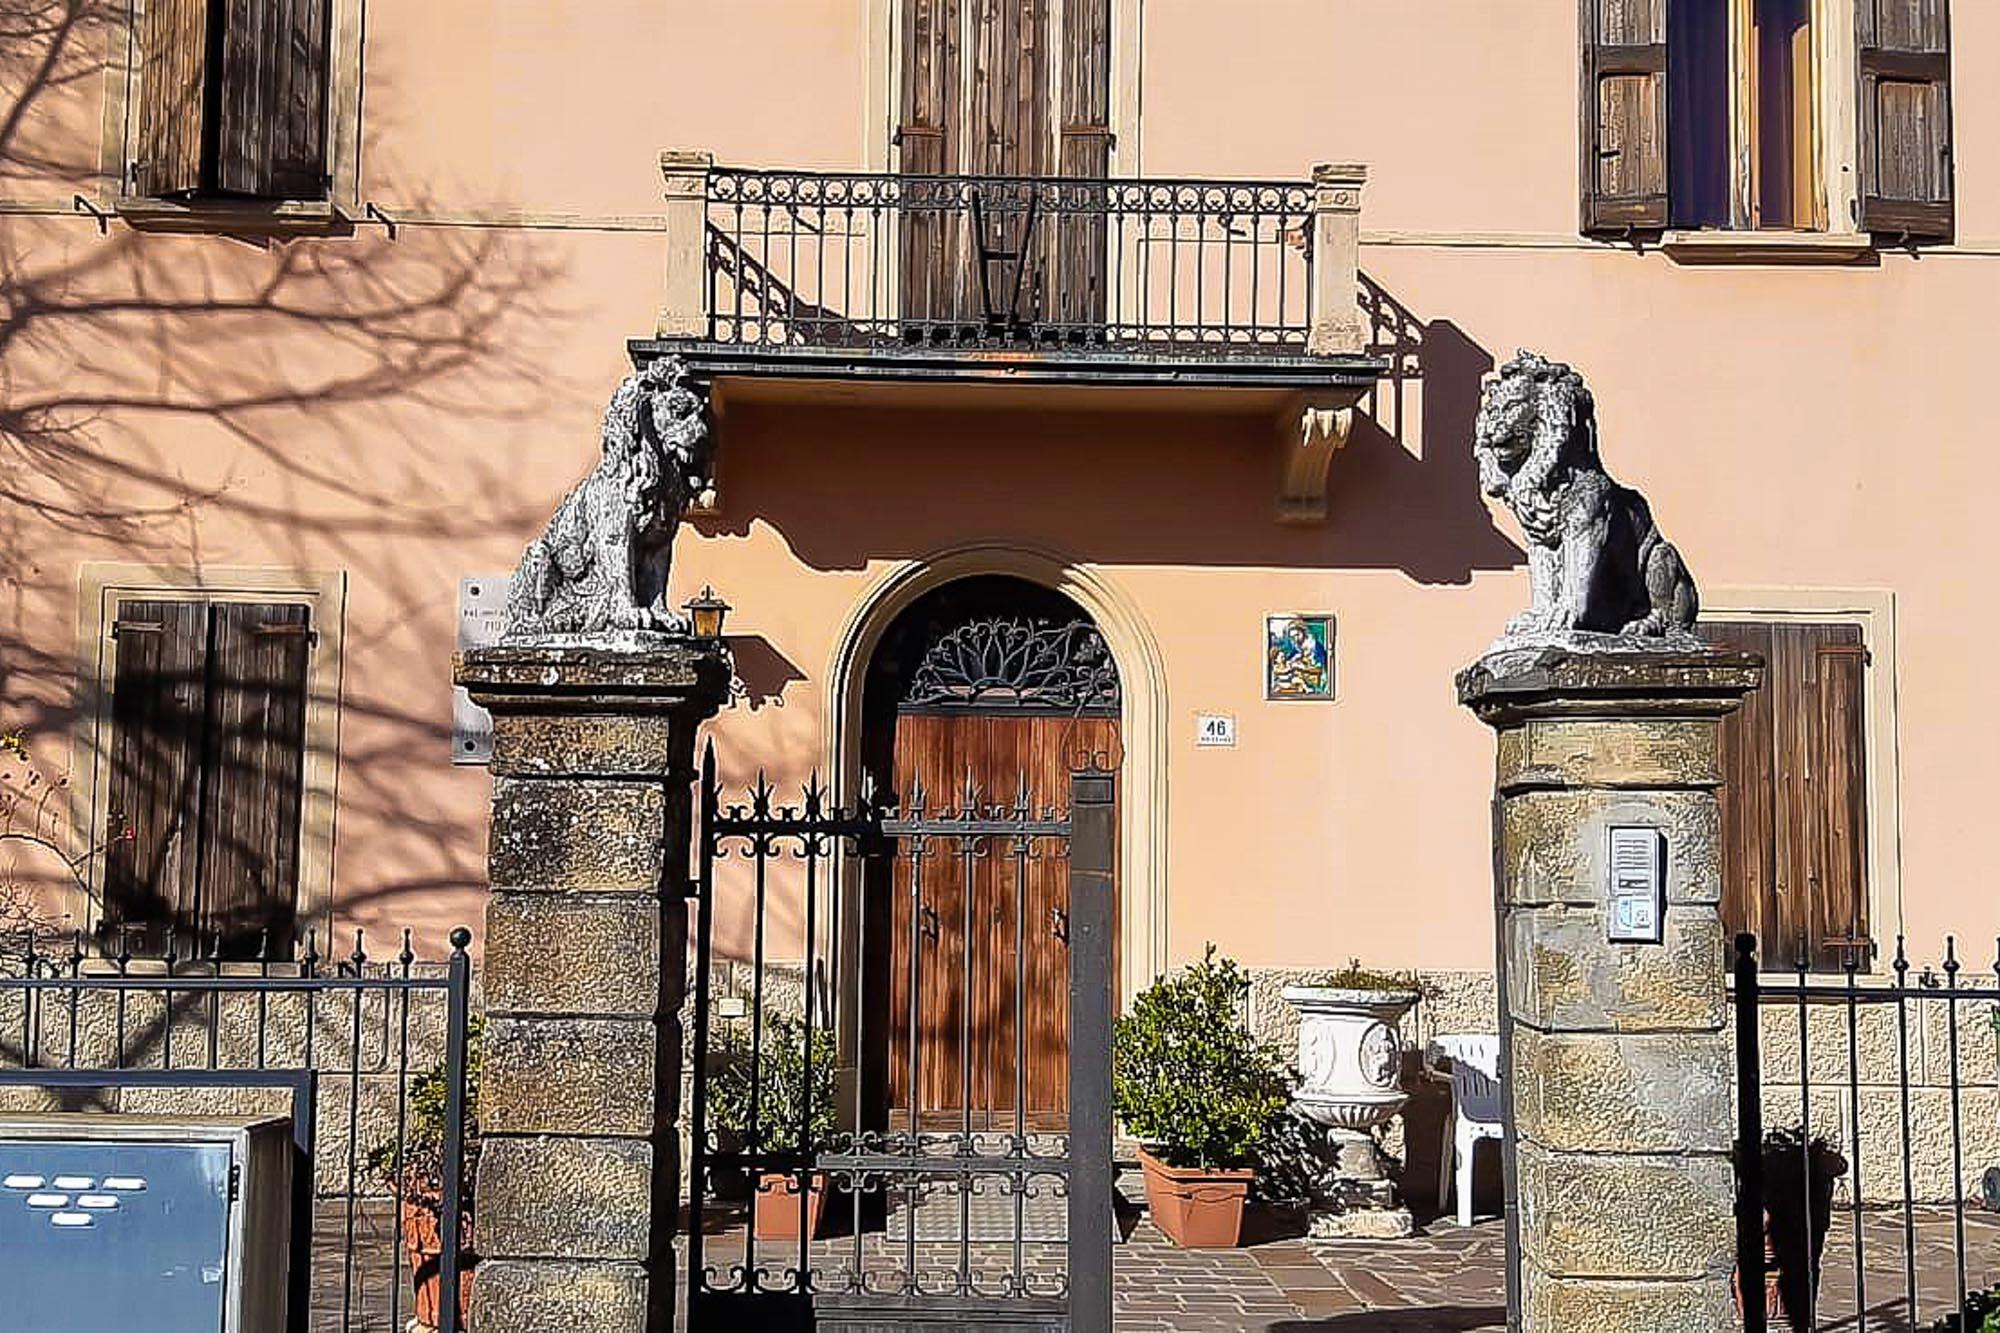 Biblioteca comunale Grizzana Morandi